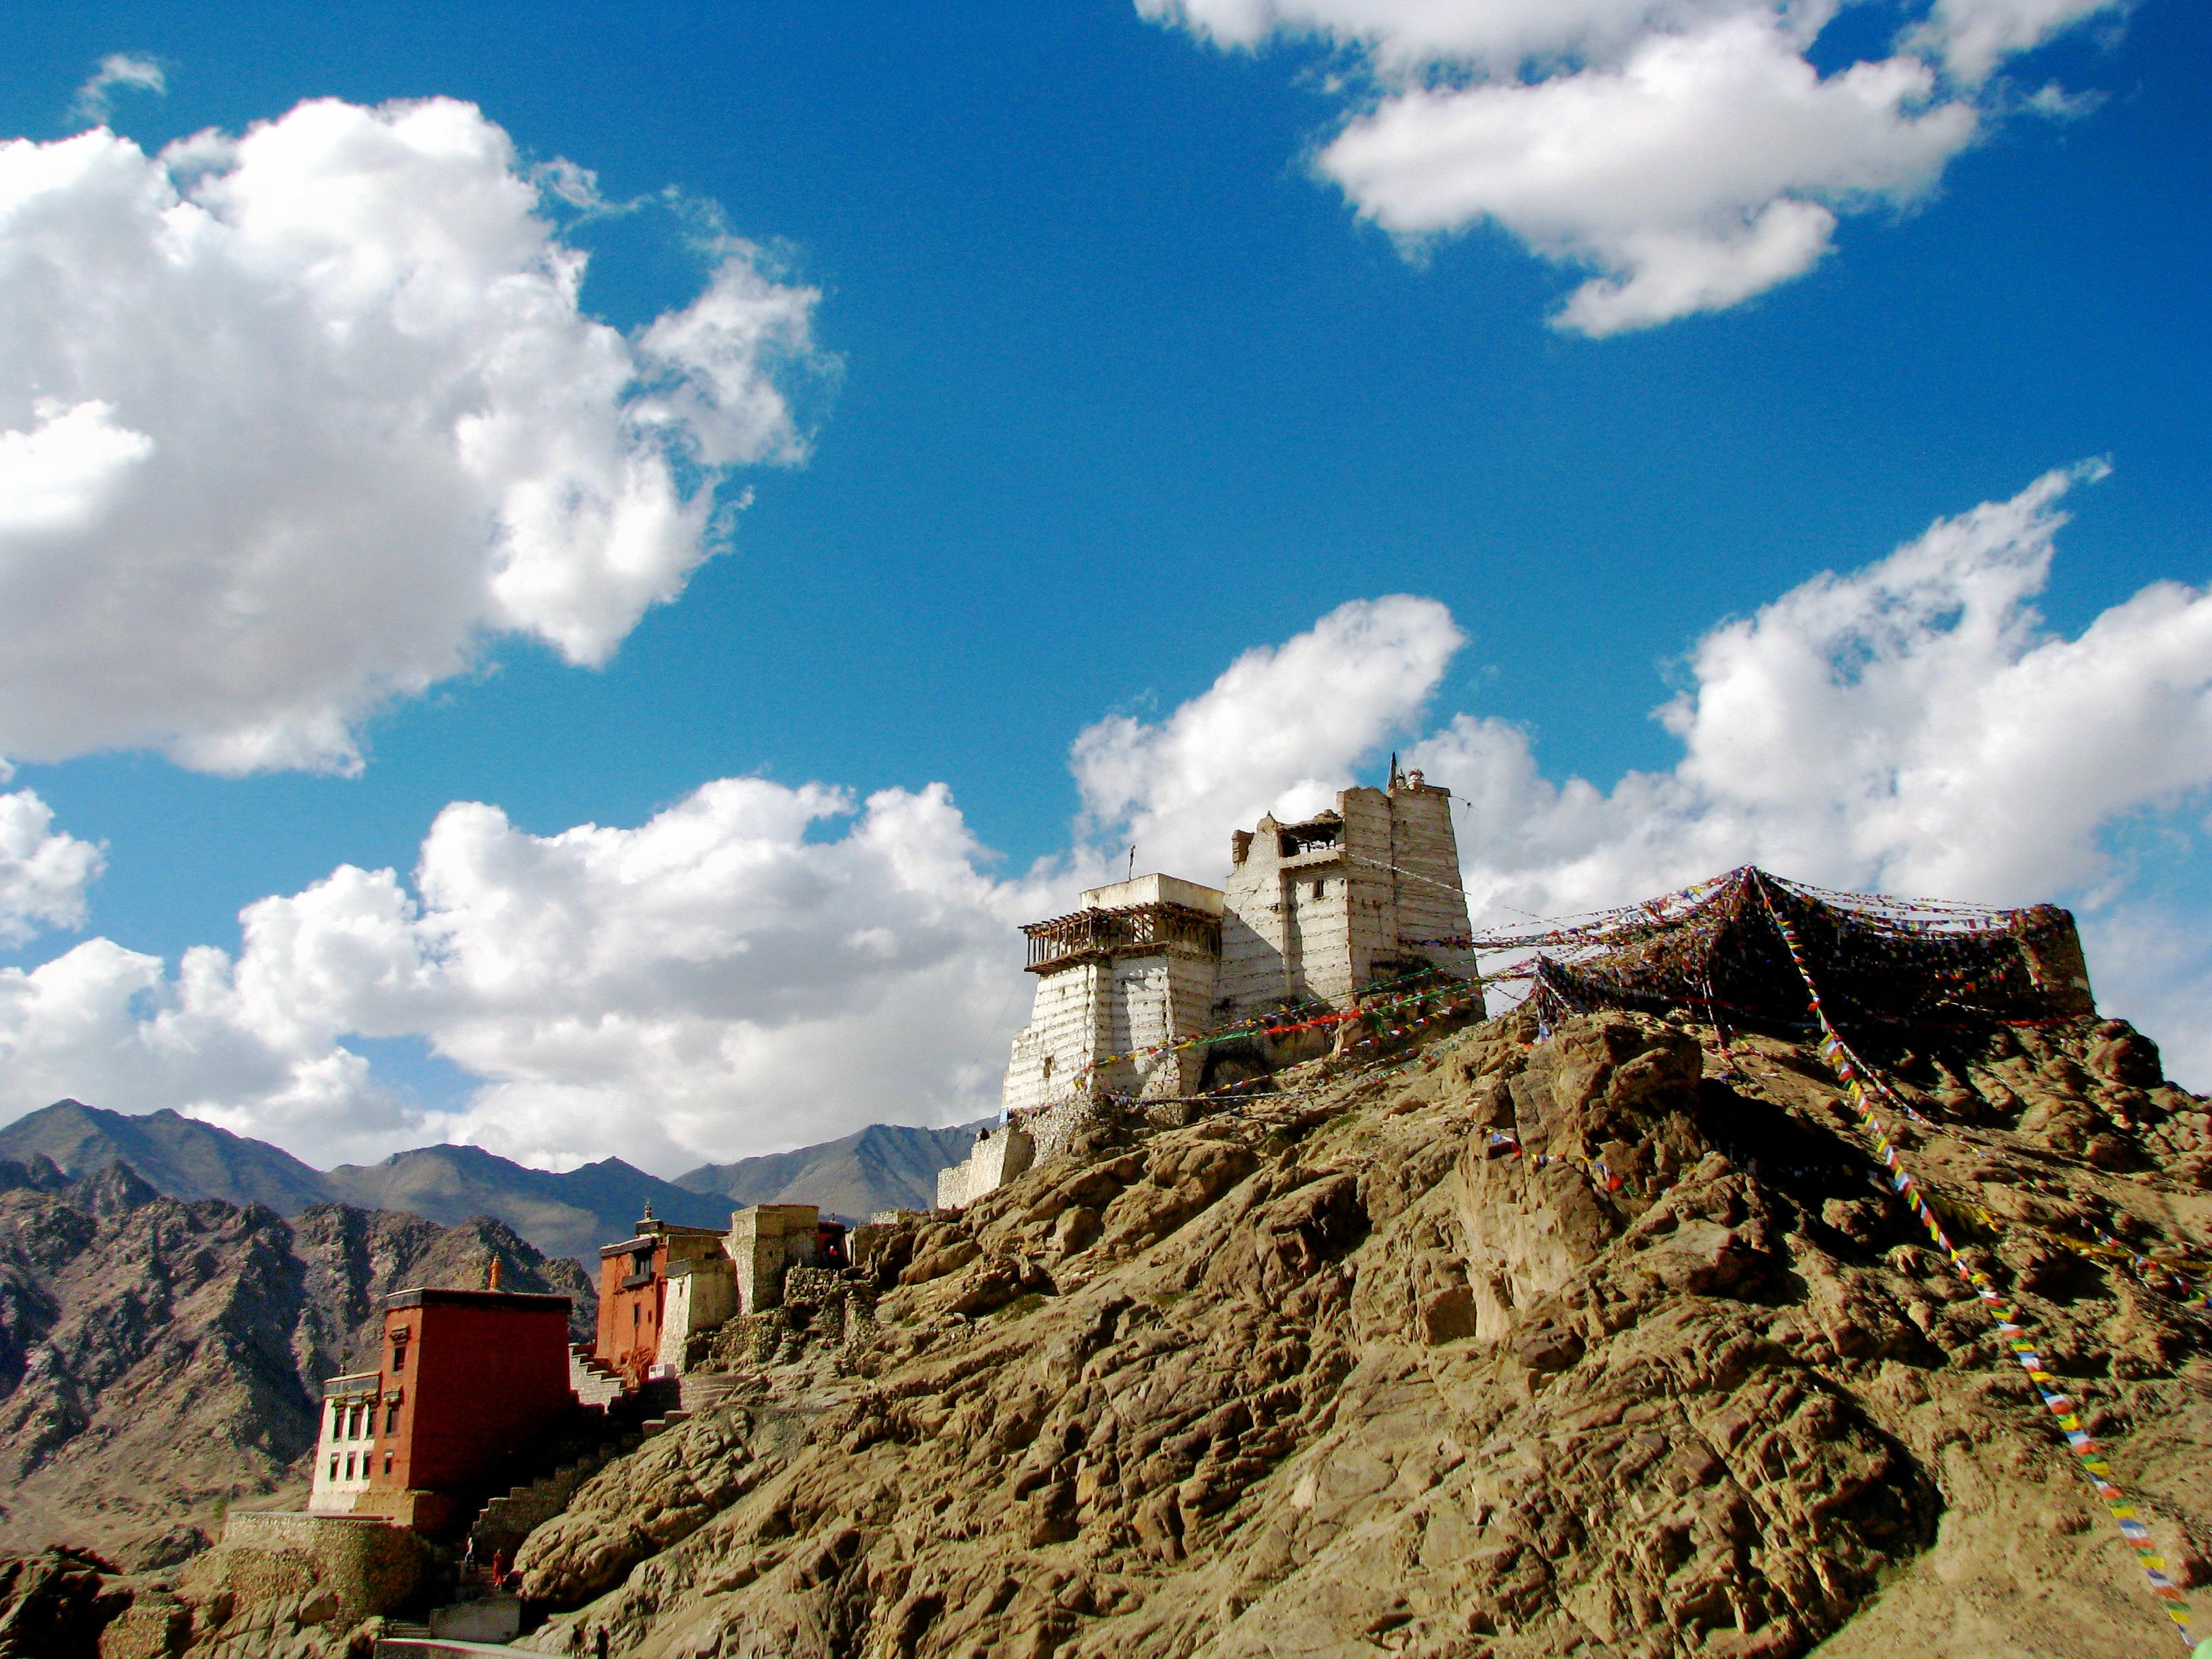 1519613072_india_-_ladakh_-_leh_-_039_-_old_fort_above_leh__283909792138_29.jpg